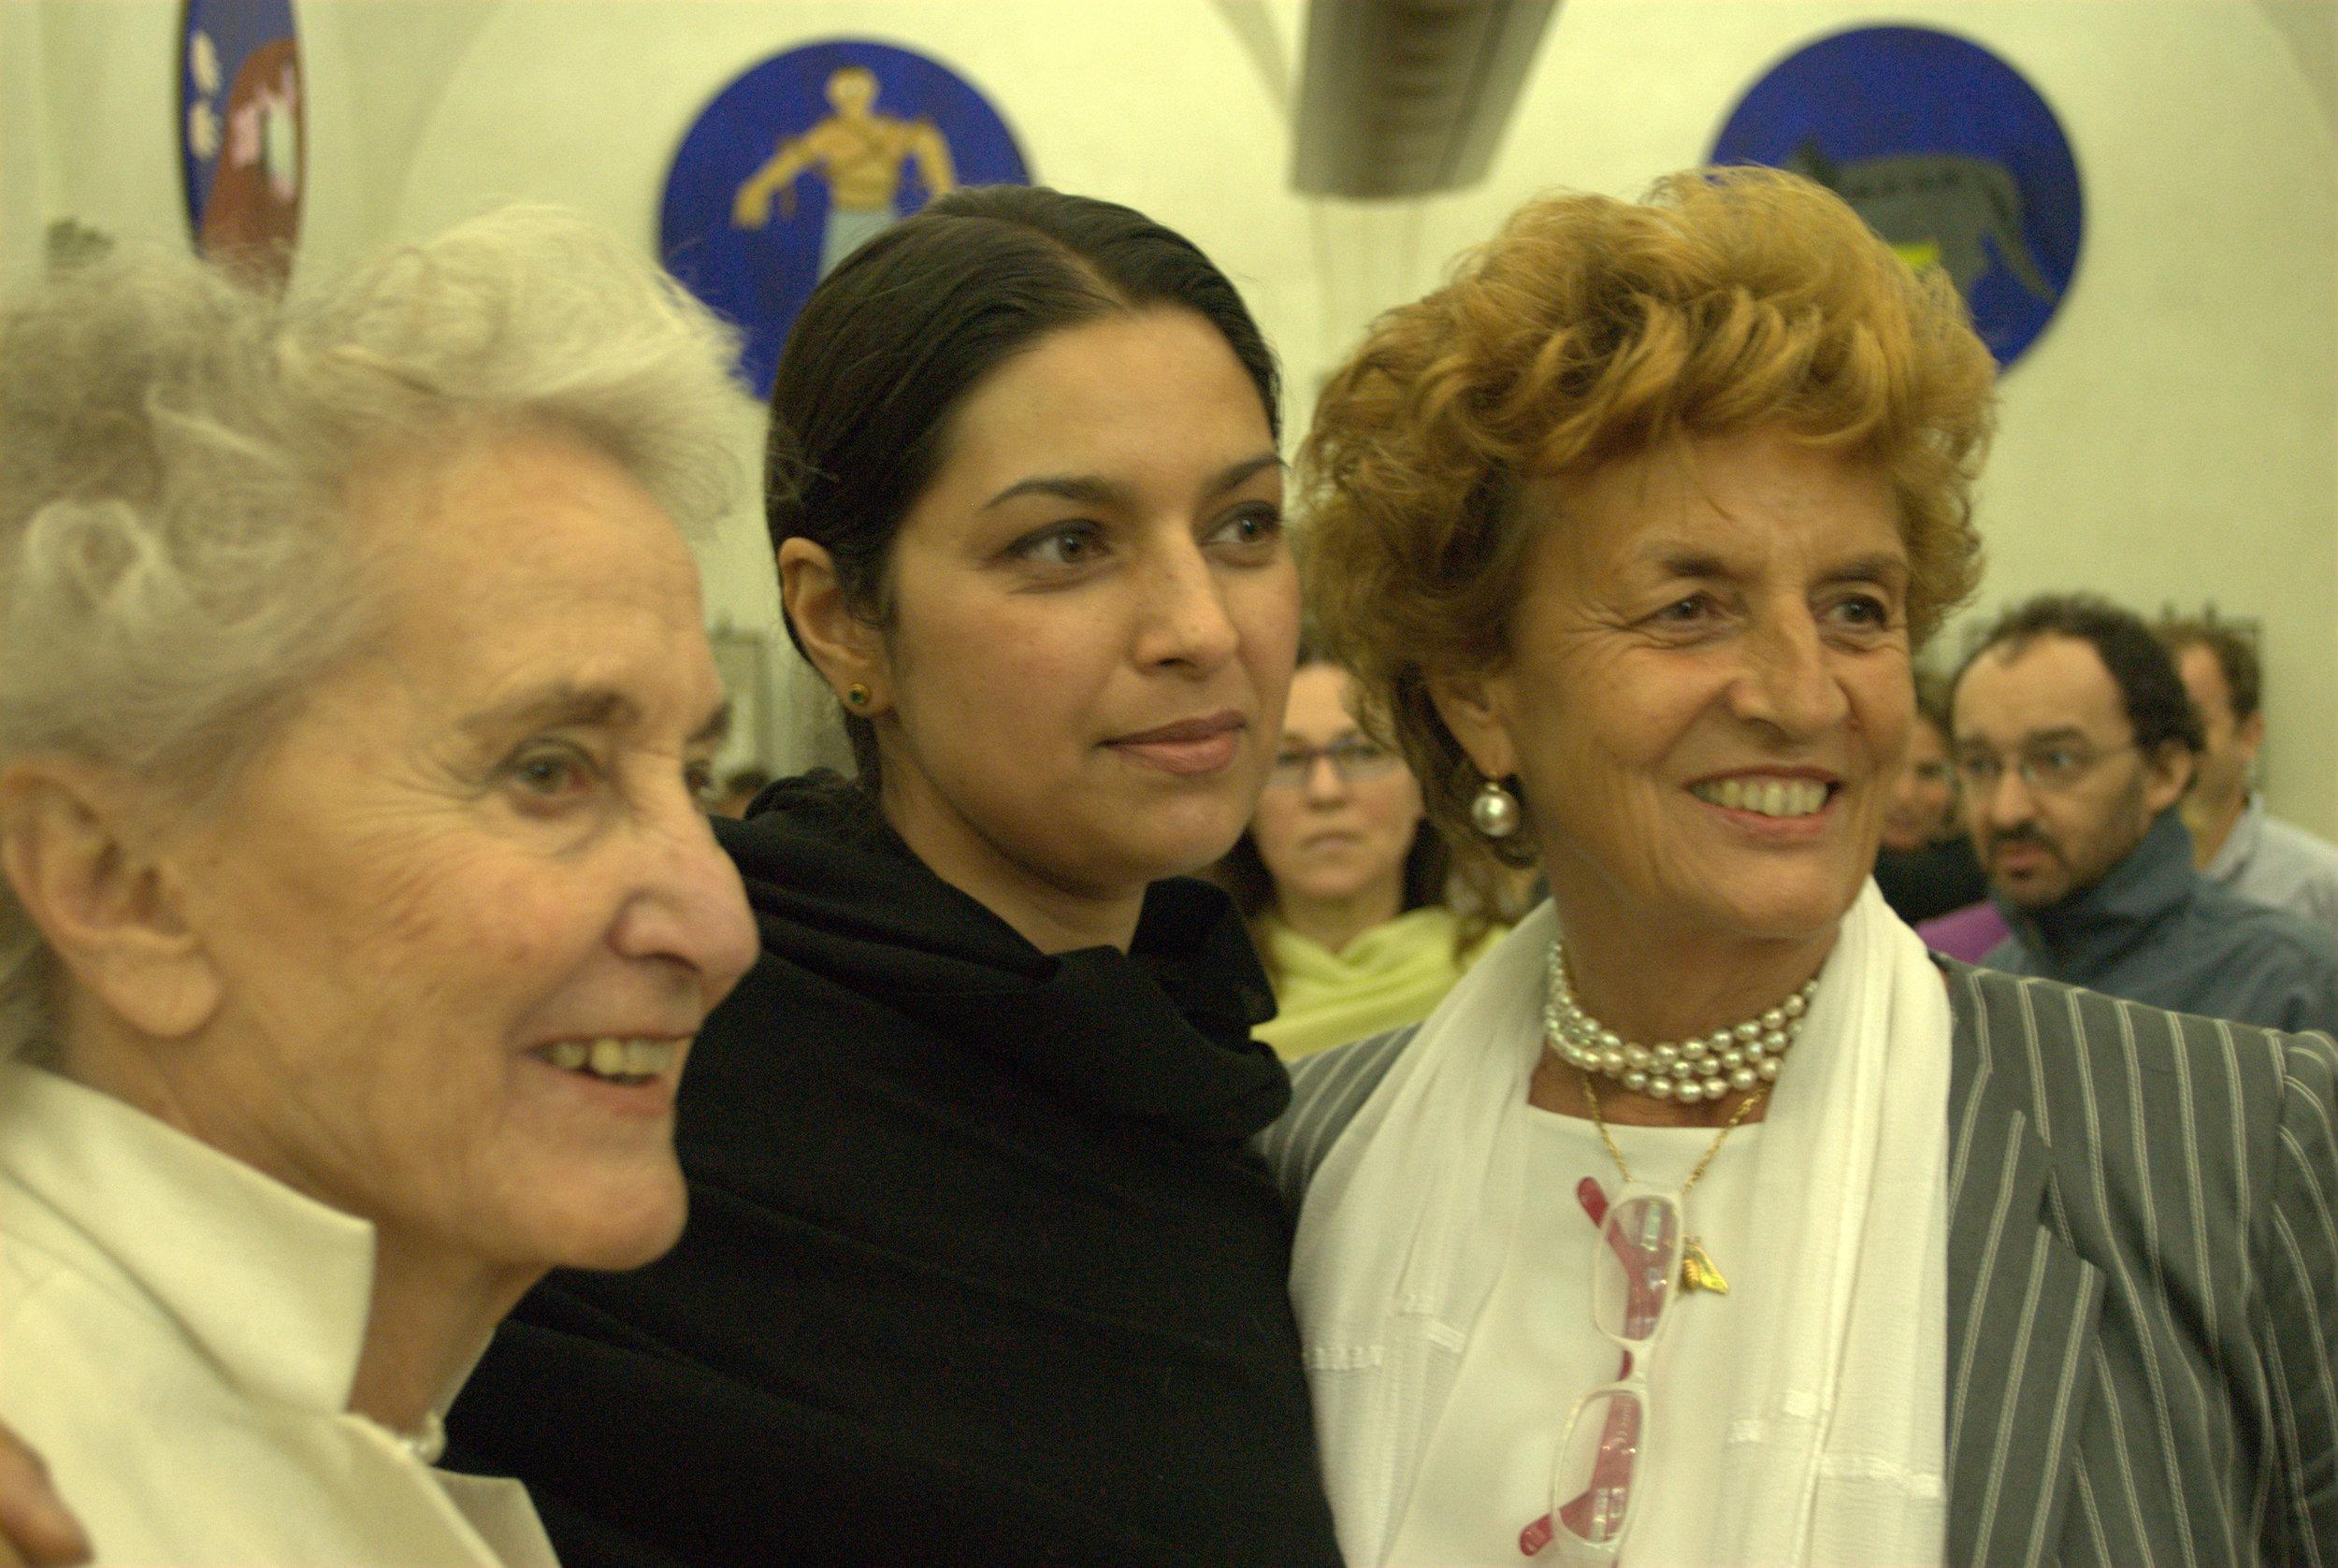 Beatrice Monti, Jhumpa Lahiri, and Giovanna Folonari